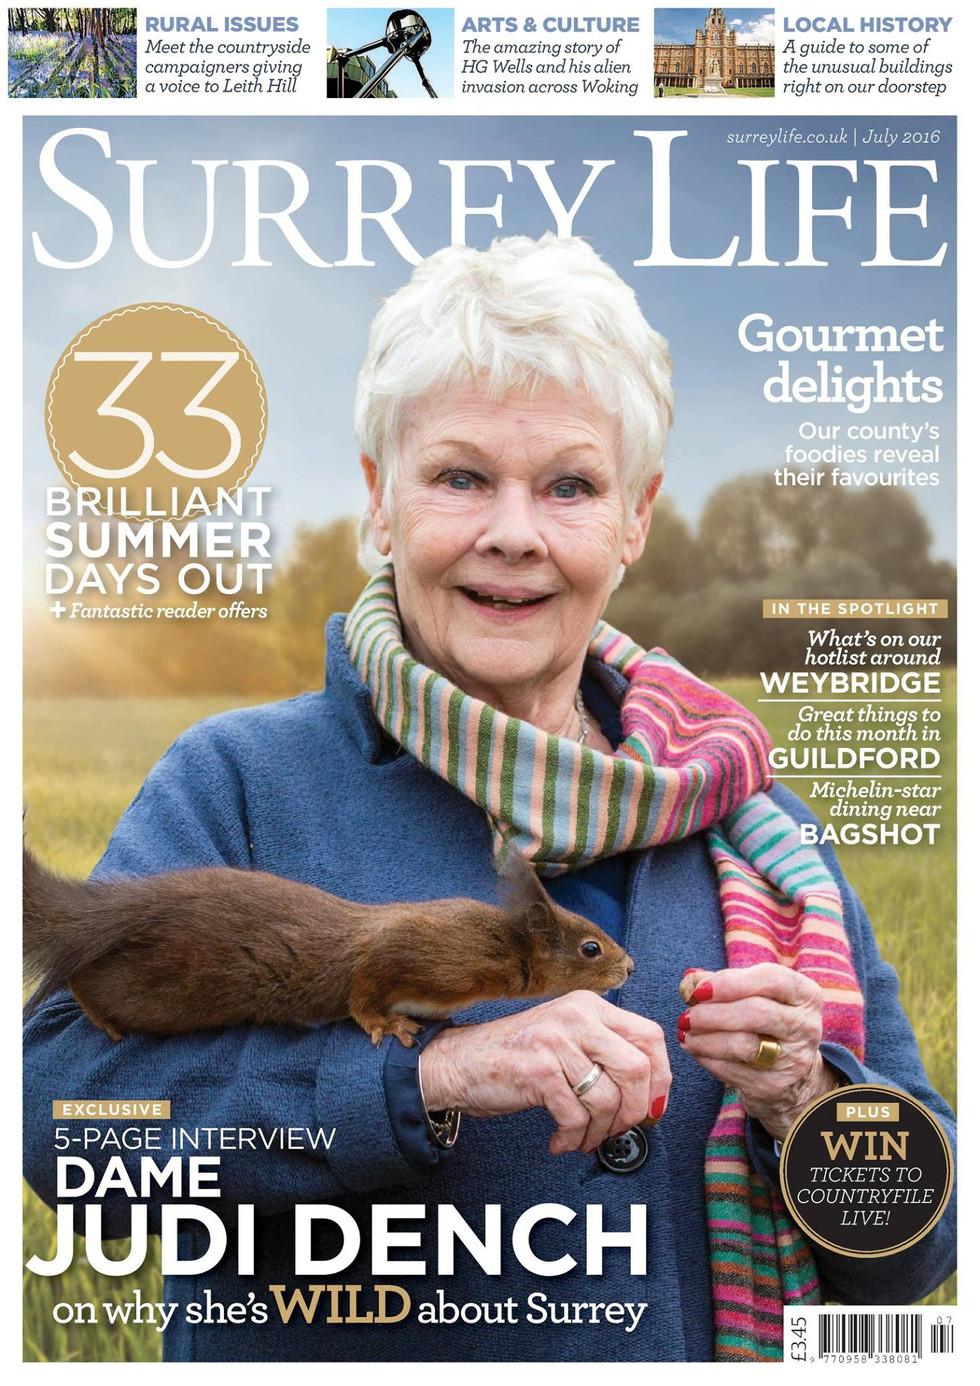 Surrey Life - Judi Dench Cover 2016